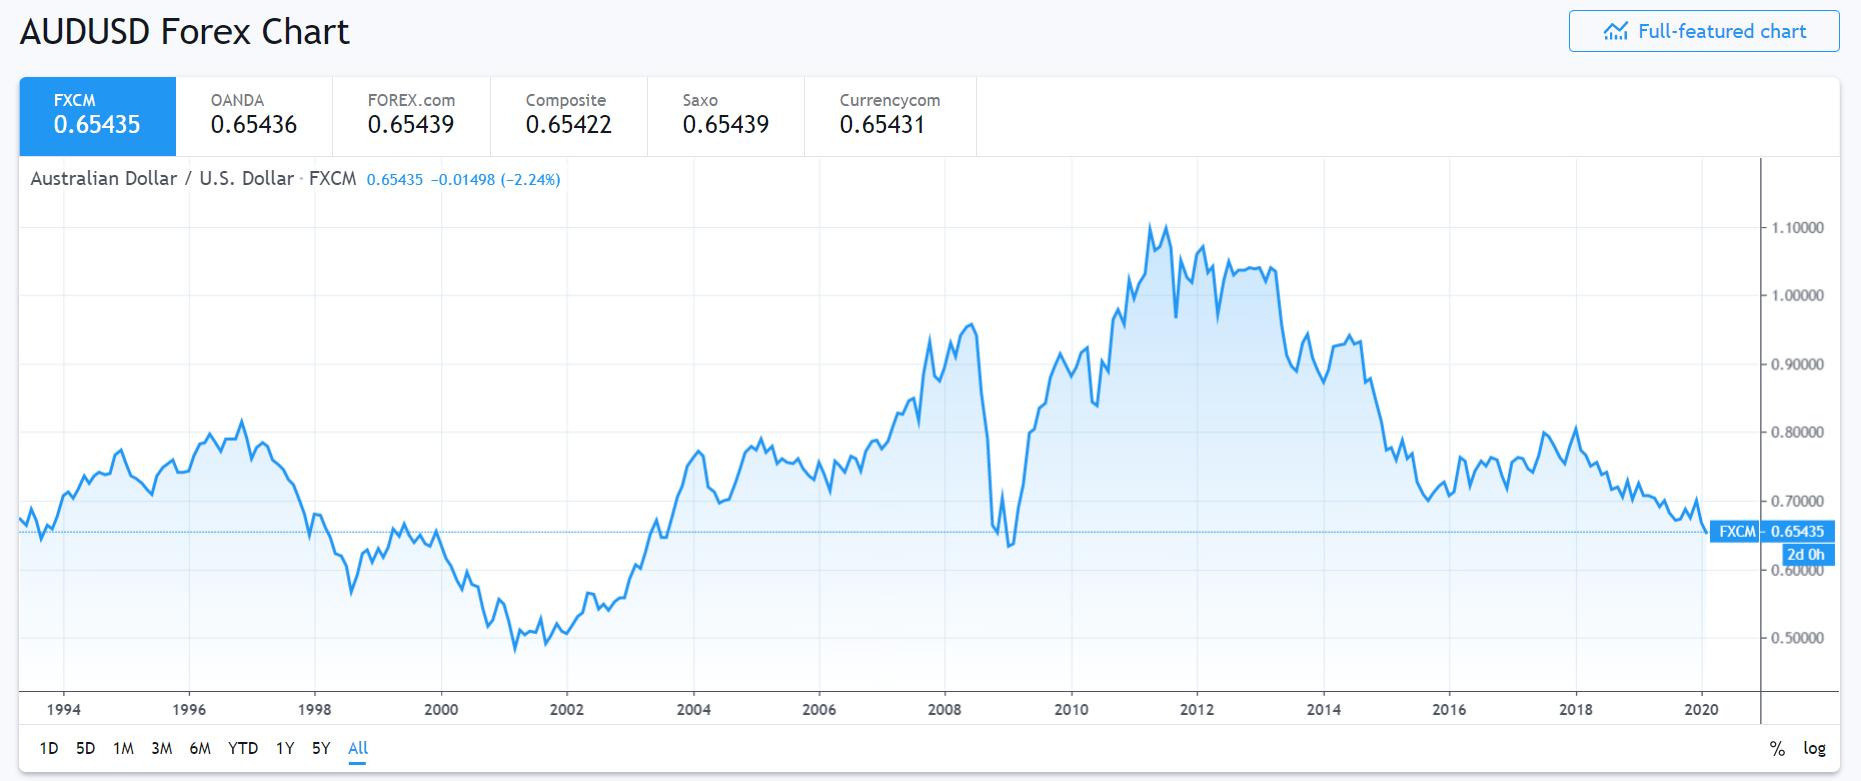 FXCM - TRADING VIEW AUD USD CHART- 27 Feb 2020